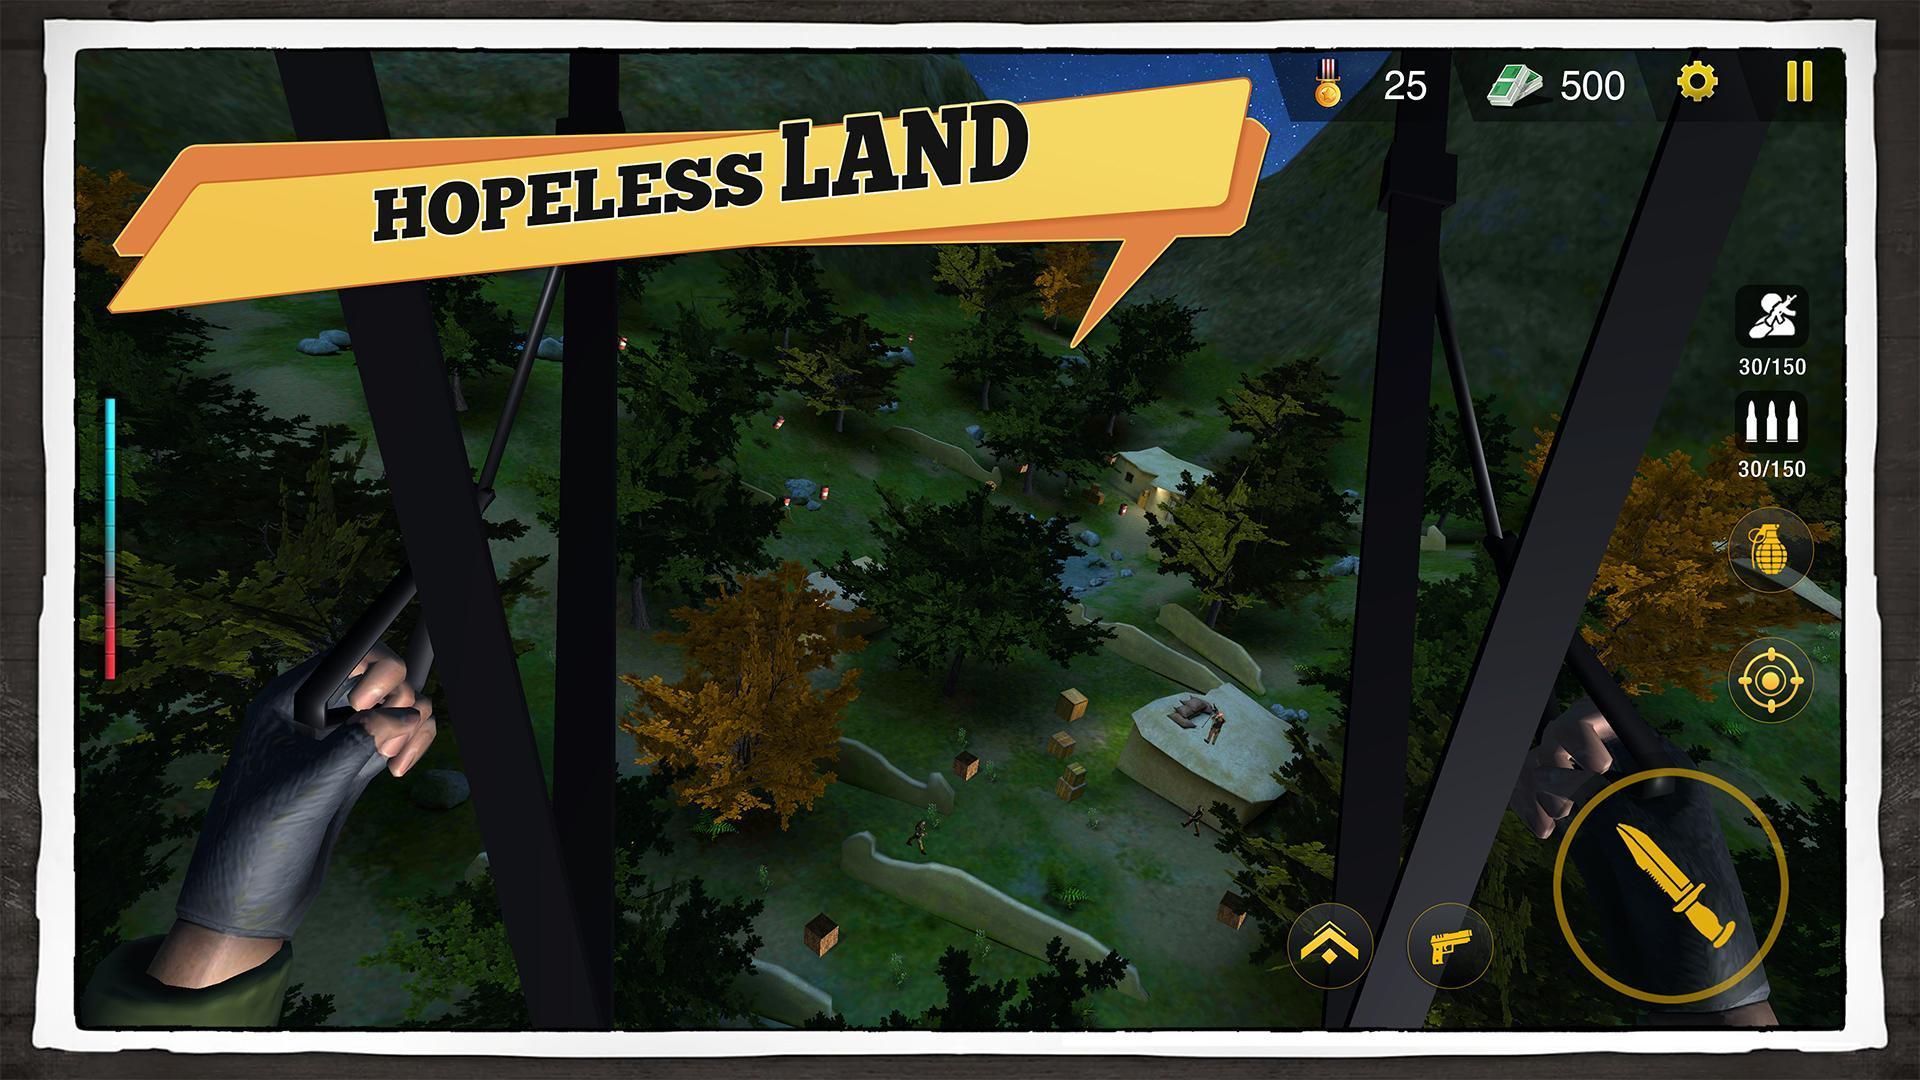 Yalghaar Delta IGI Commando Adventure Mobile Game 3.4 Screenshot 3